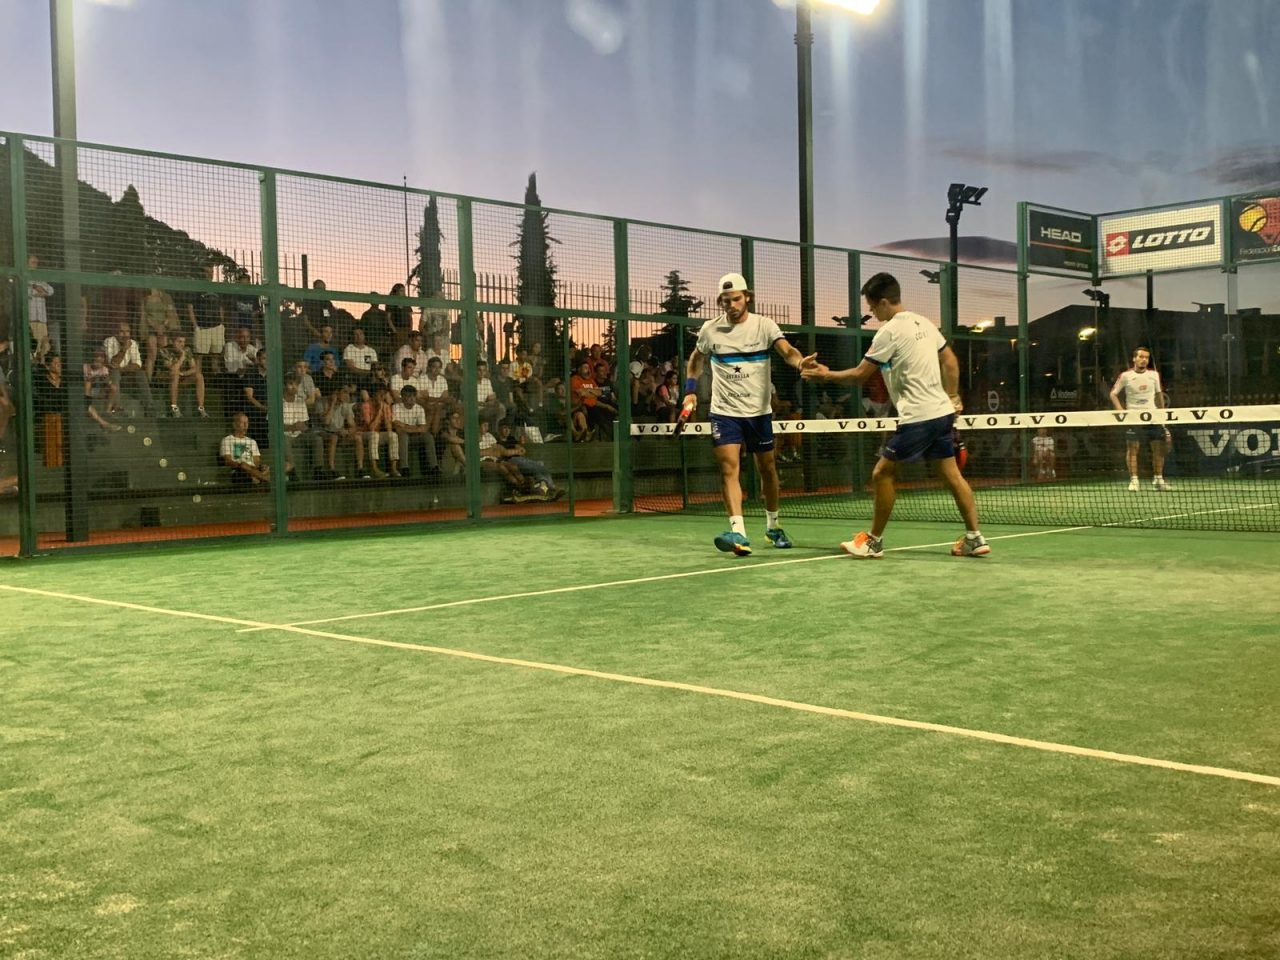 subcampeones campeonato espana padel sub 23 2019